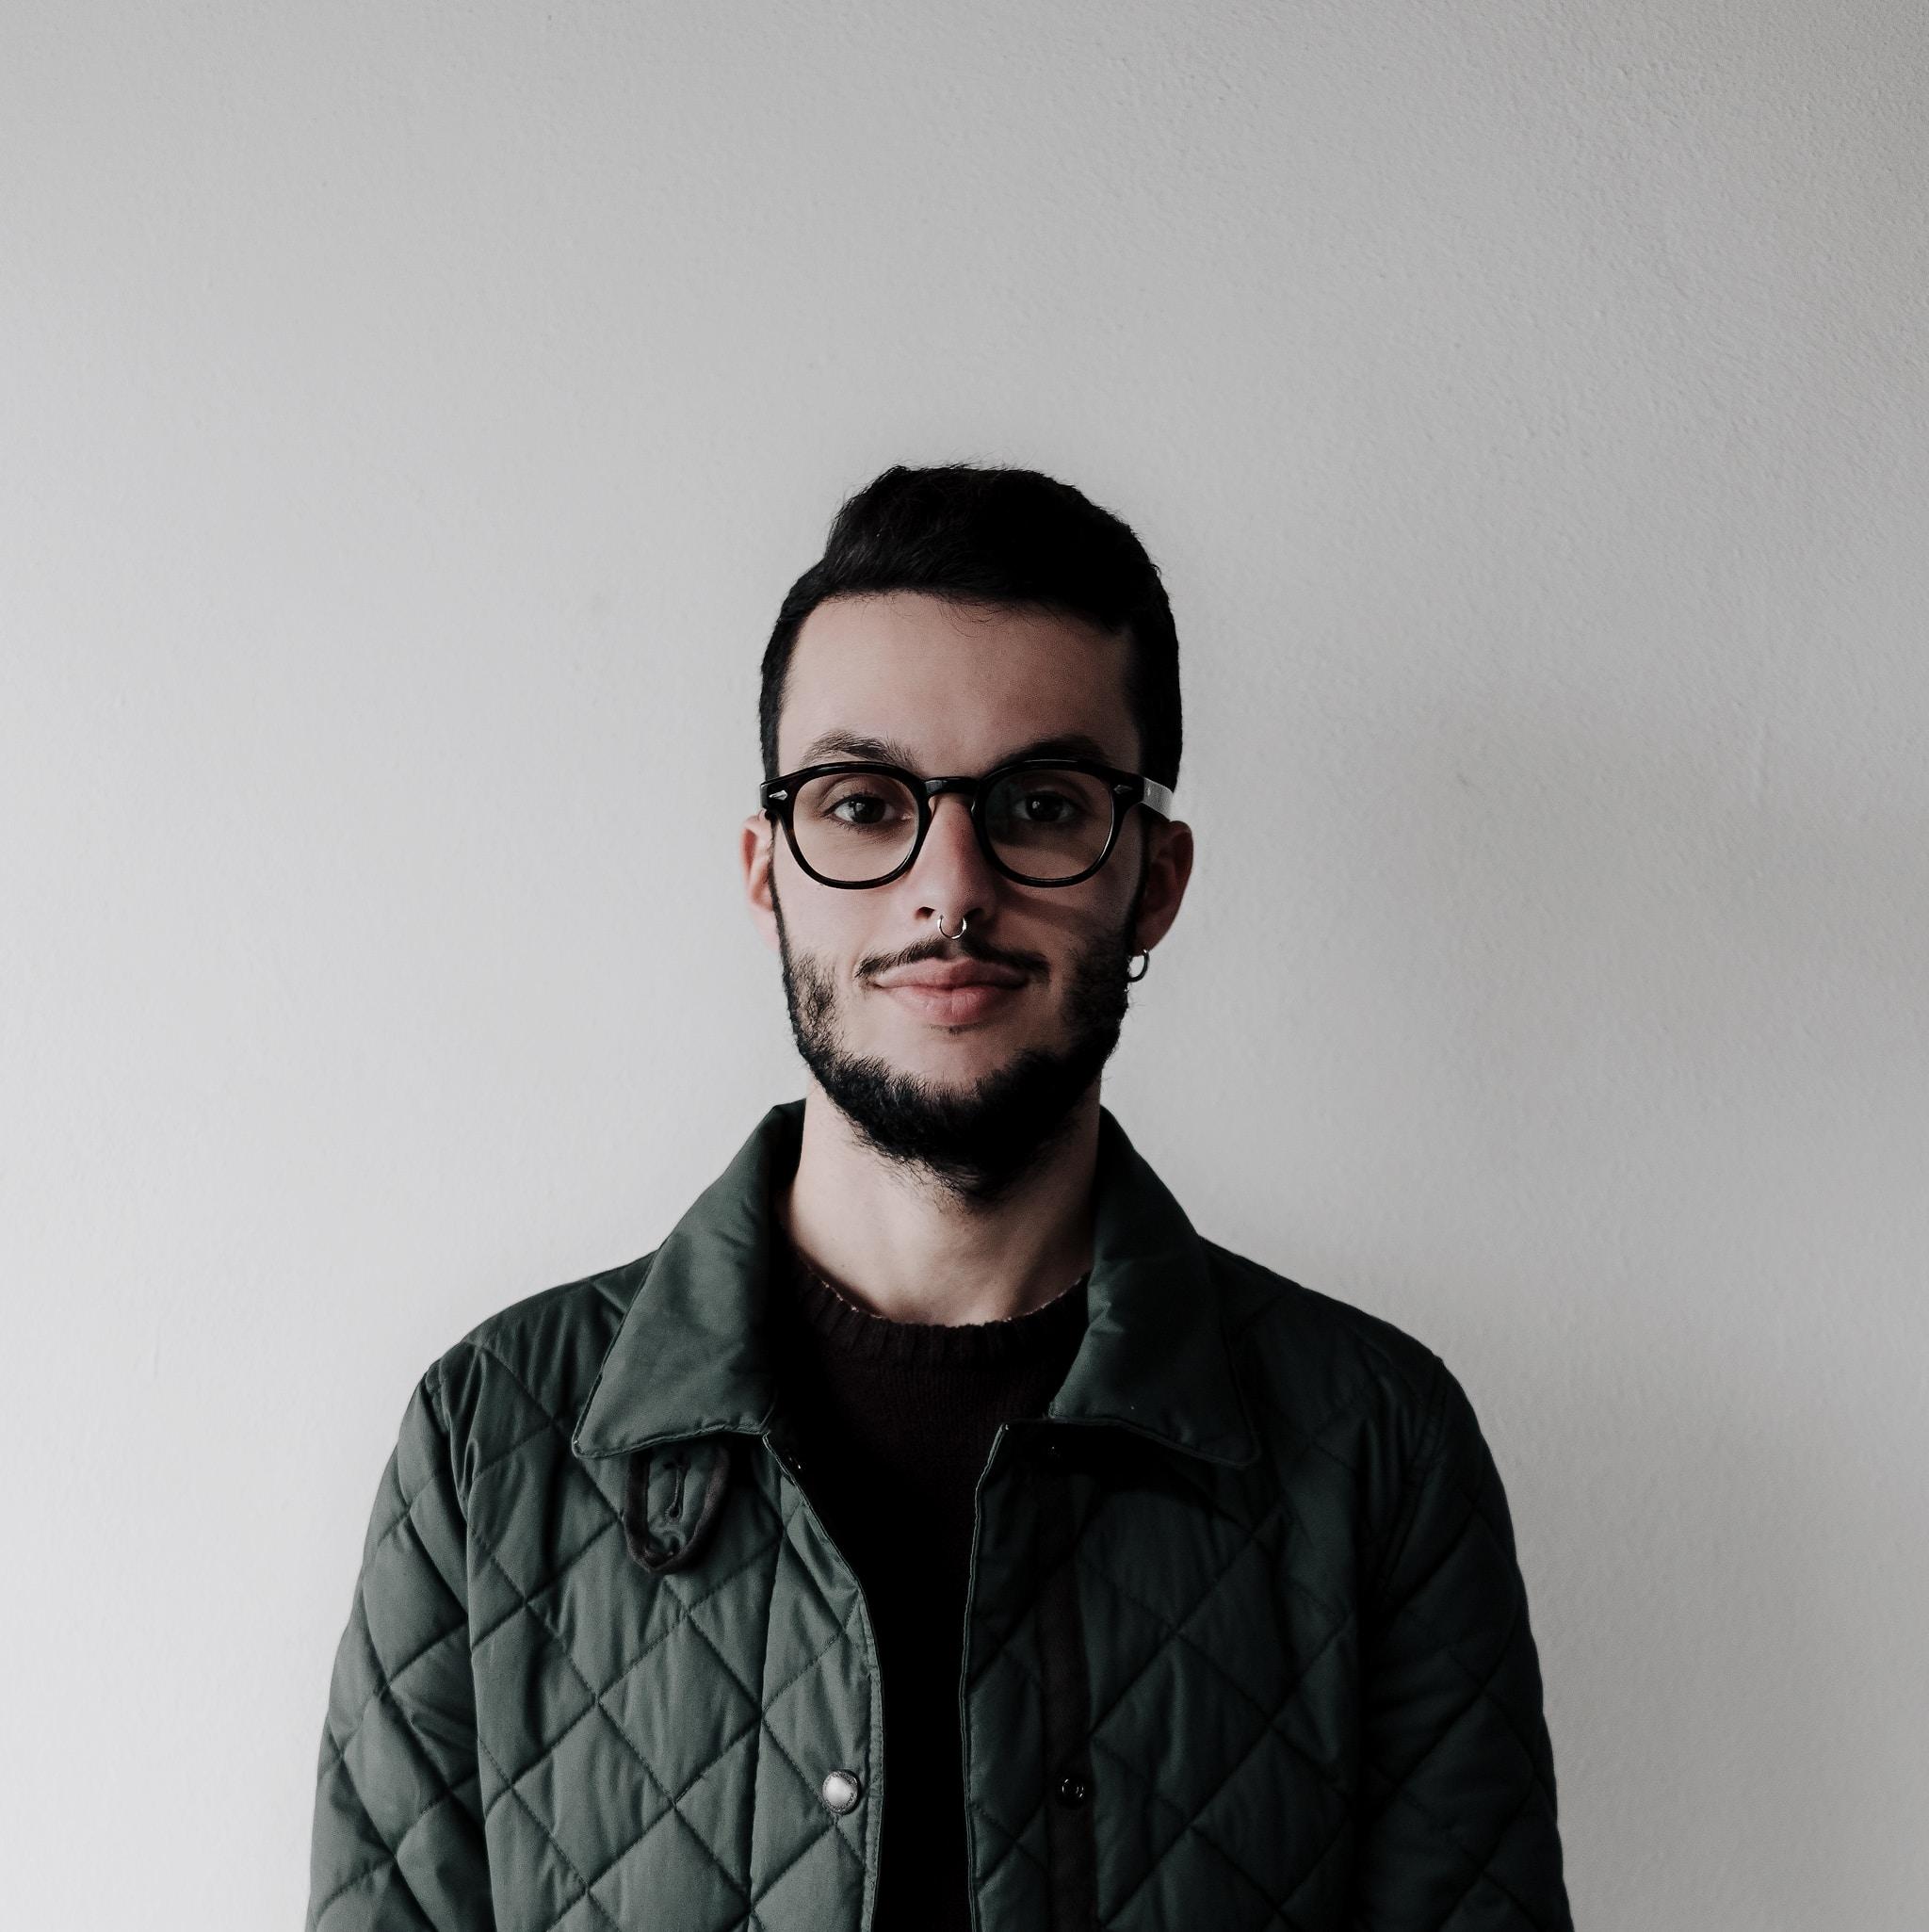 Go to Matteo Raimondi's profile